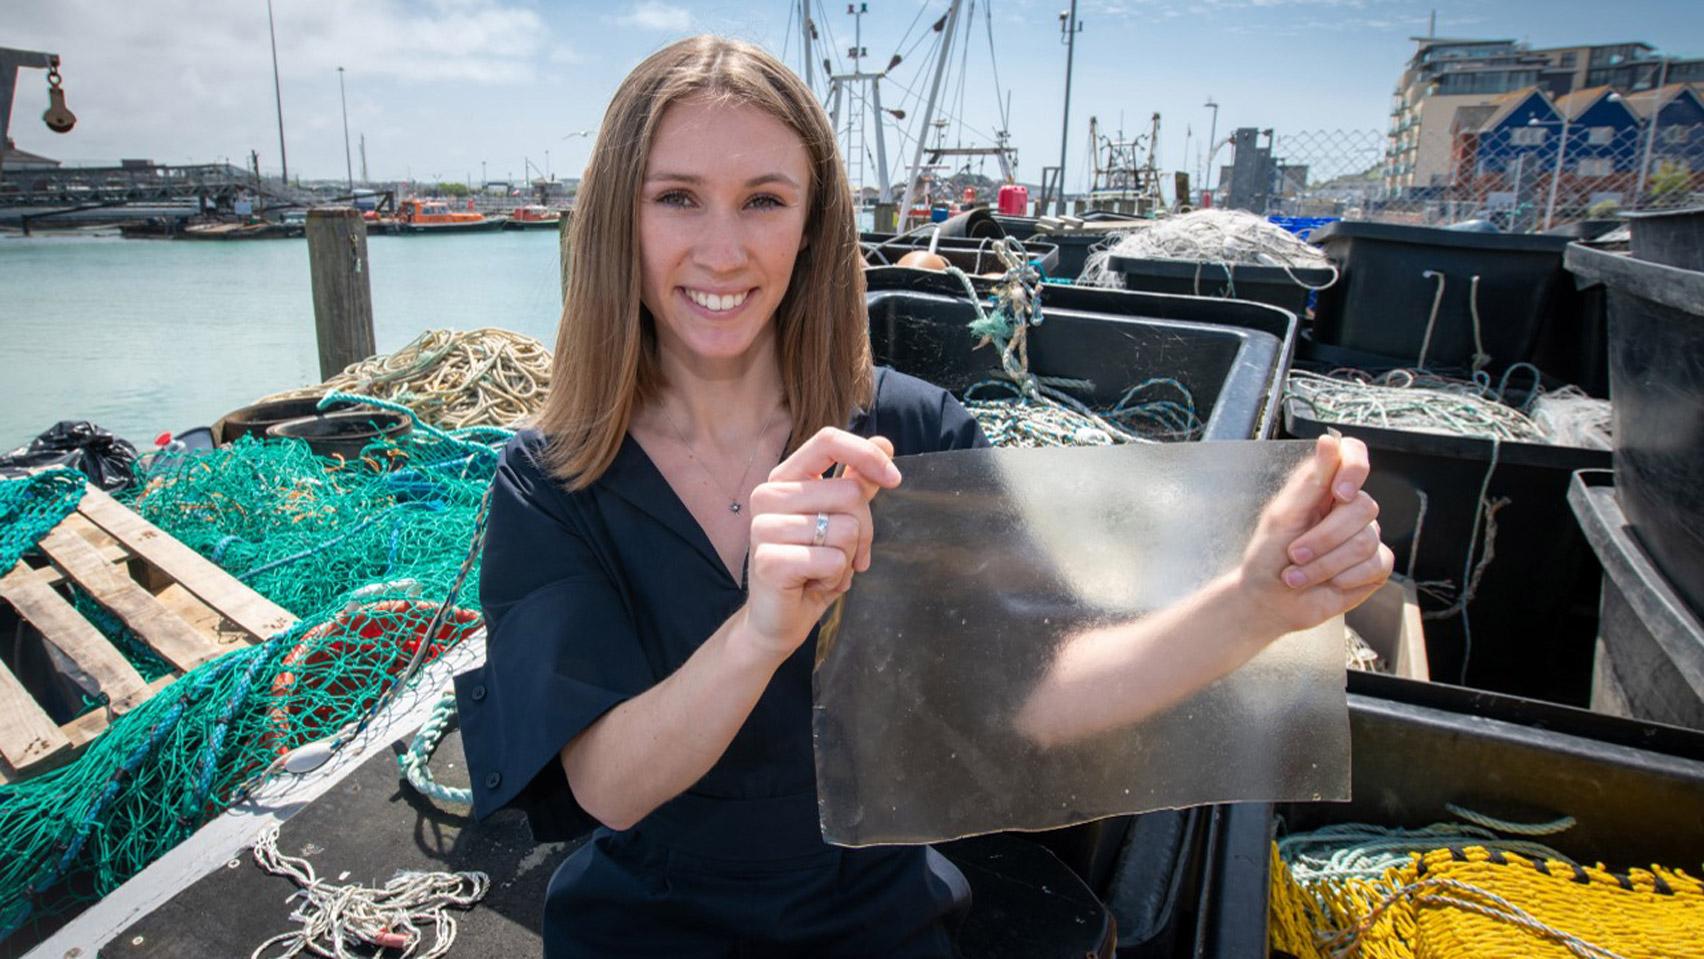 UK student's fish-waste bioplastic MarinaTex wins 2019 James Dyson Award top prize